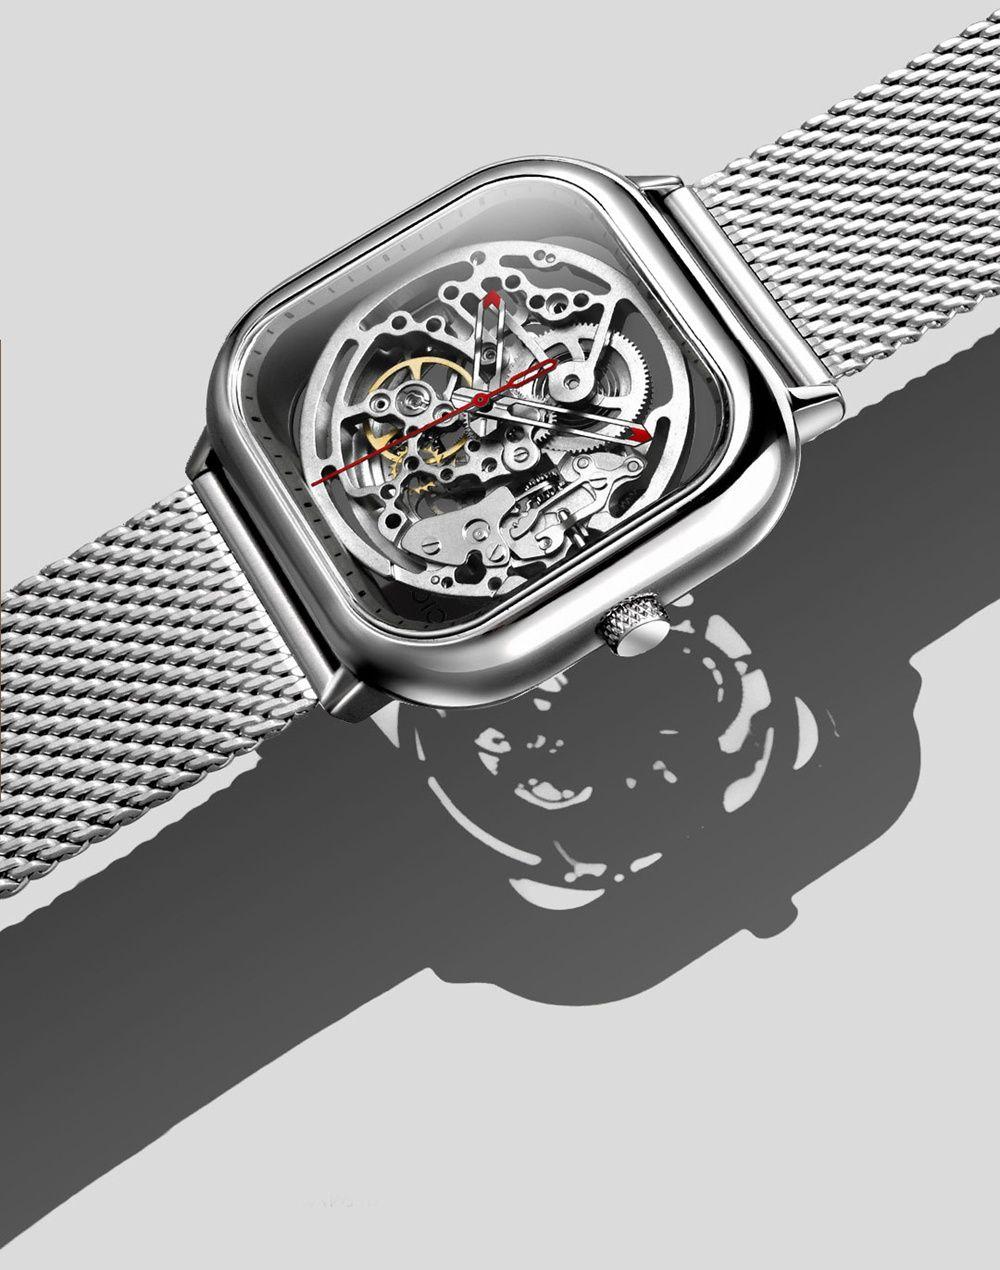 8ffc9540f1b Xiaomi CIGA Wristwatch Hollow Mechanical Stainless Steel Braided Band  Automatic Mechanical Core Men s Watch -Black